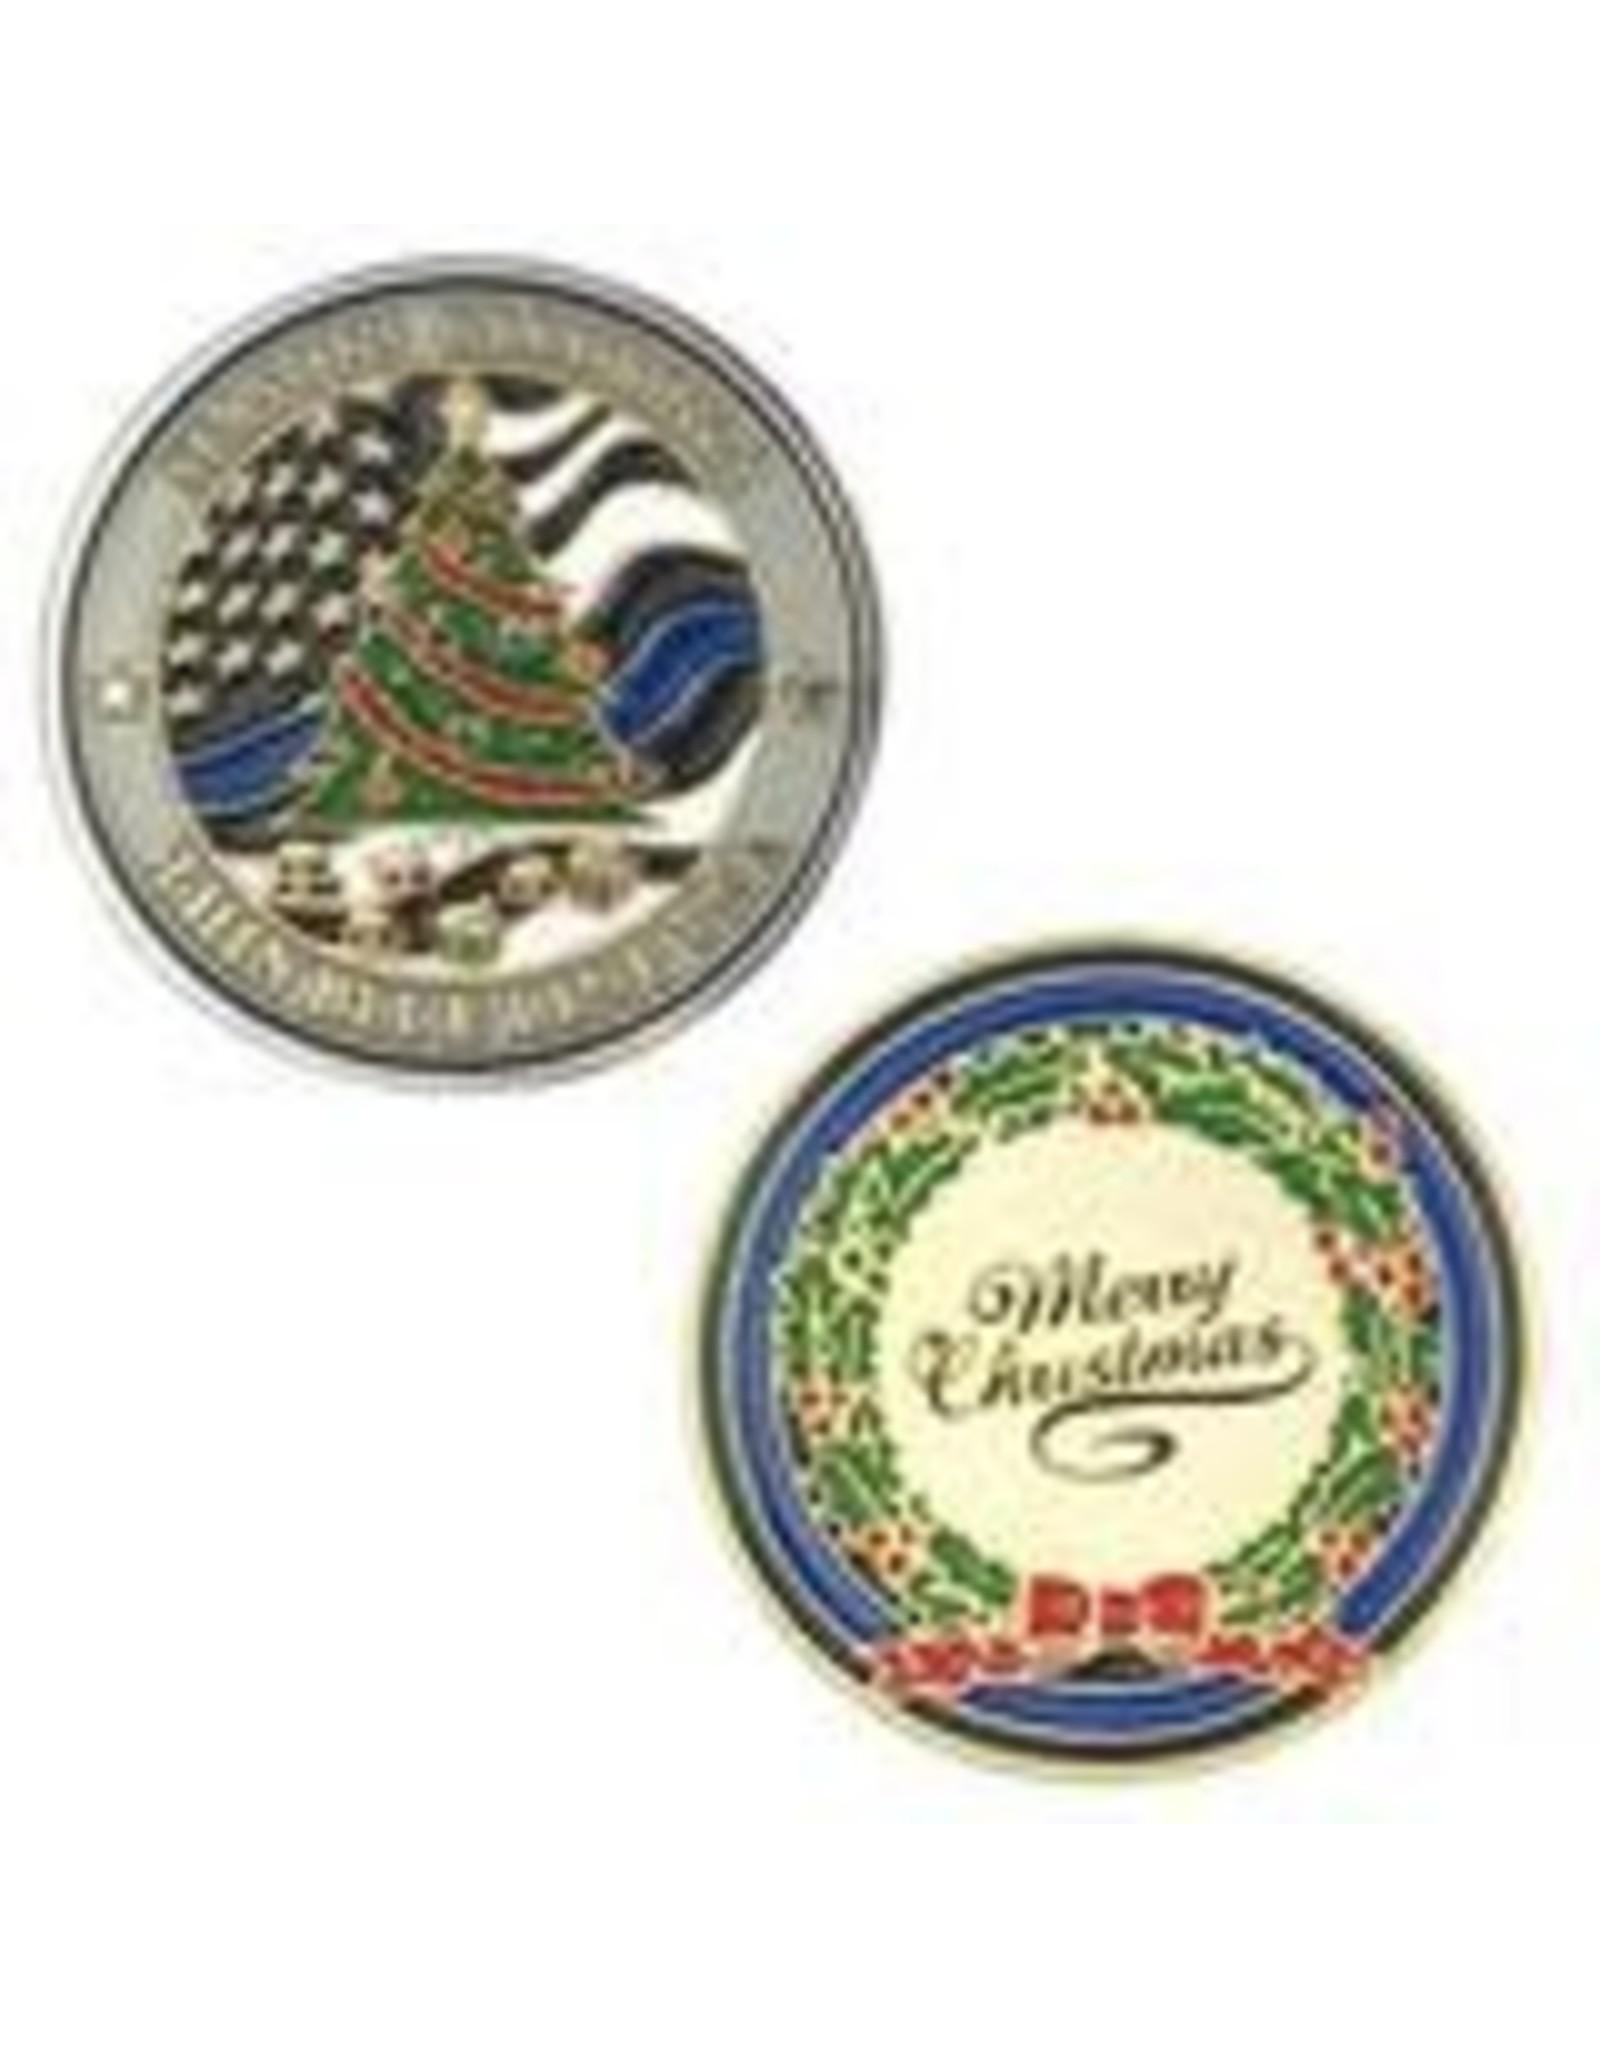 Thin Blue Line USA Challenge Coin - Limited Edition Christmas Season's Greeting